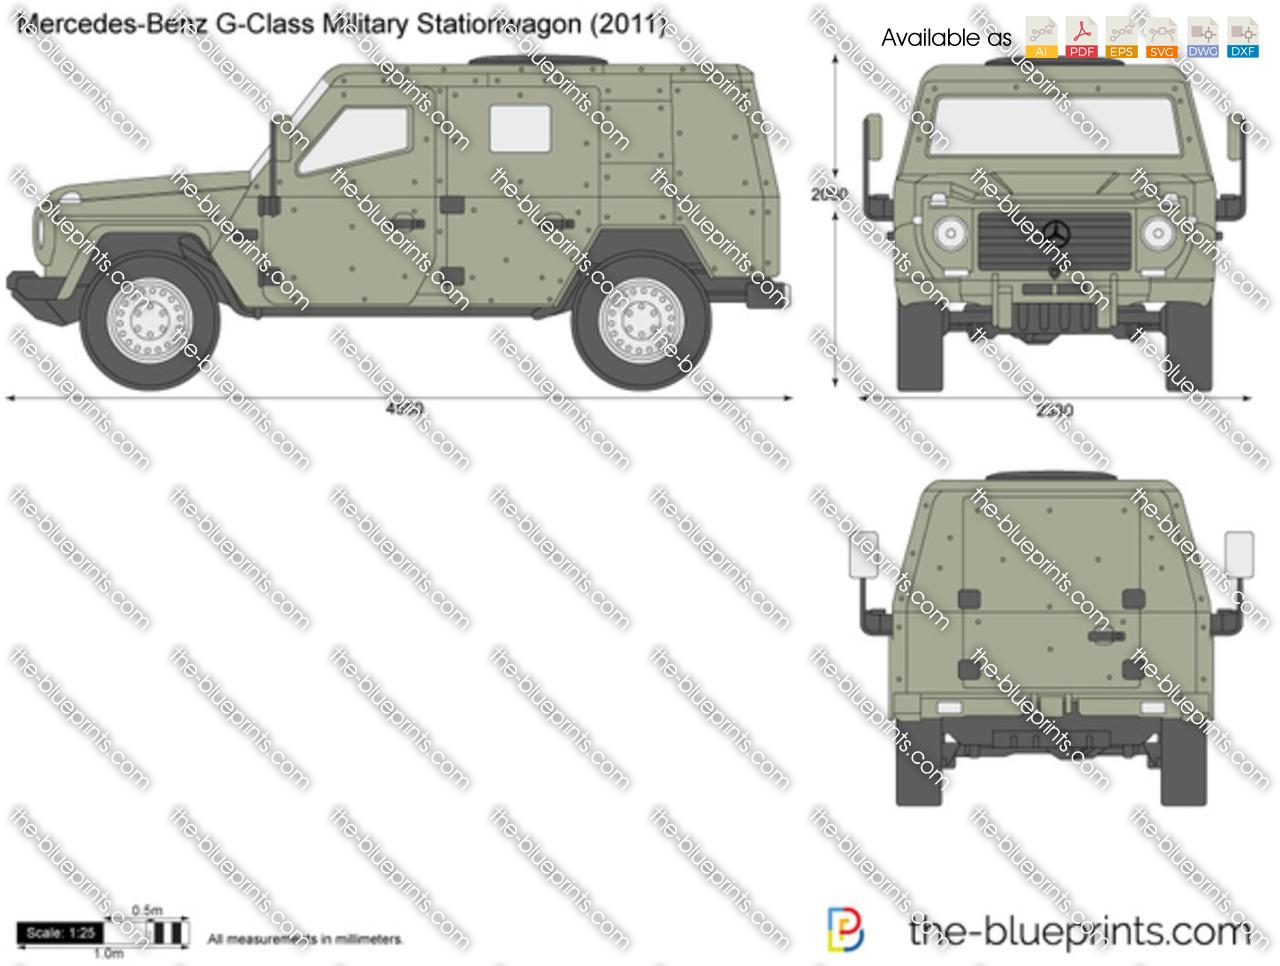 Mercedes-Benz G-Class Military Stationwagon W461 vector